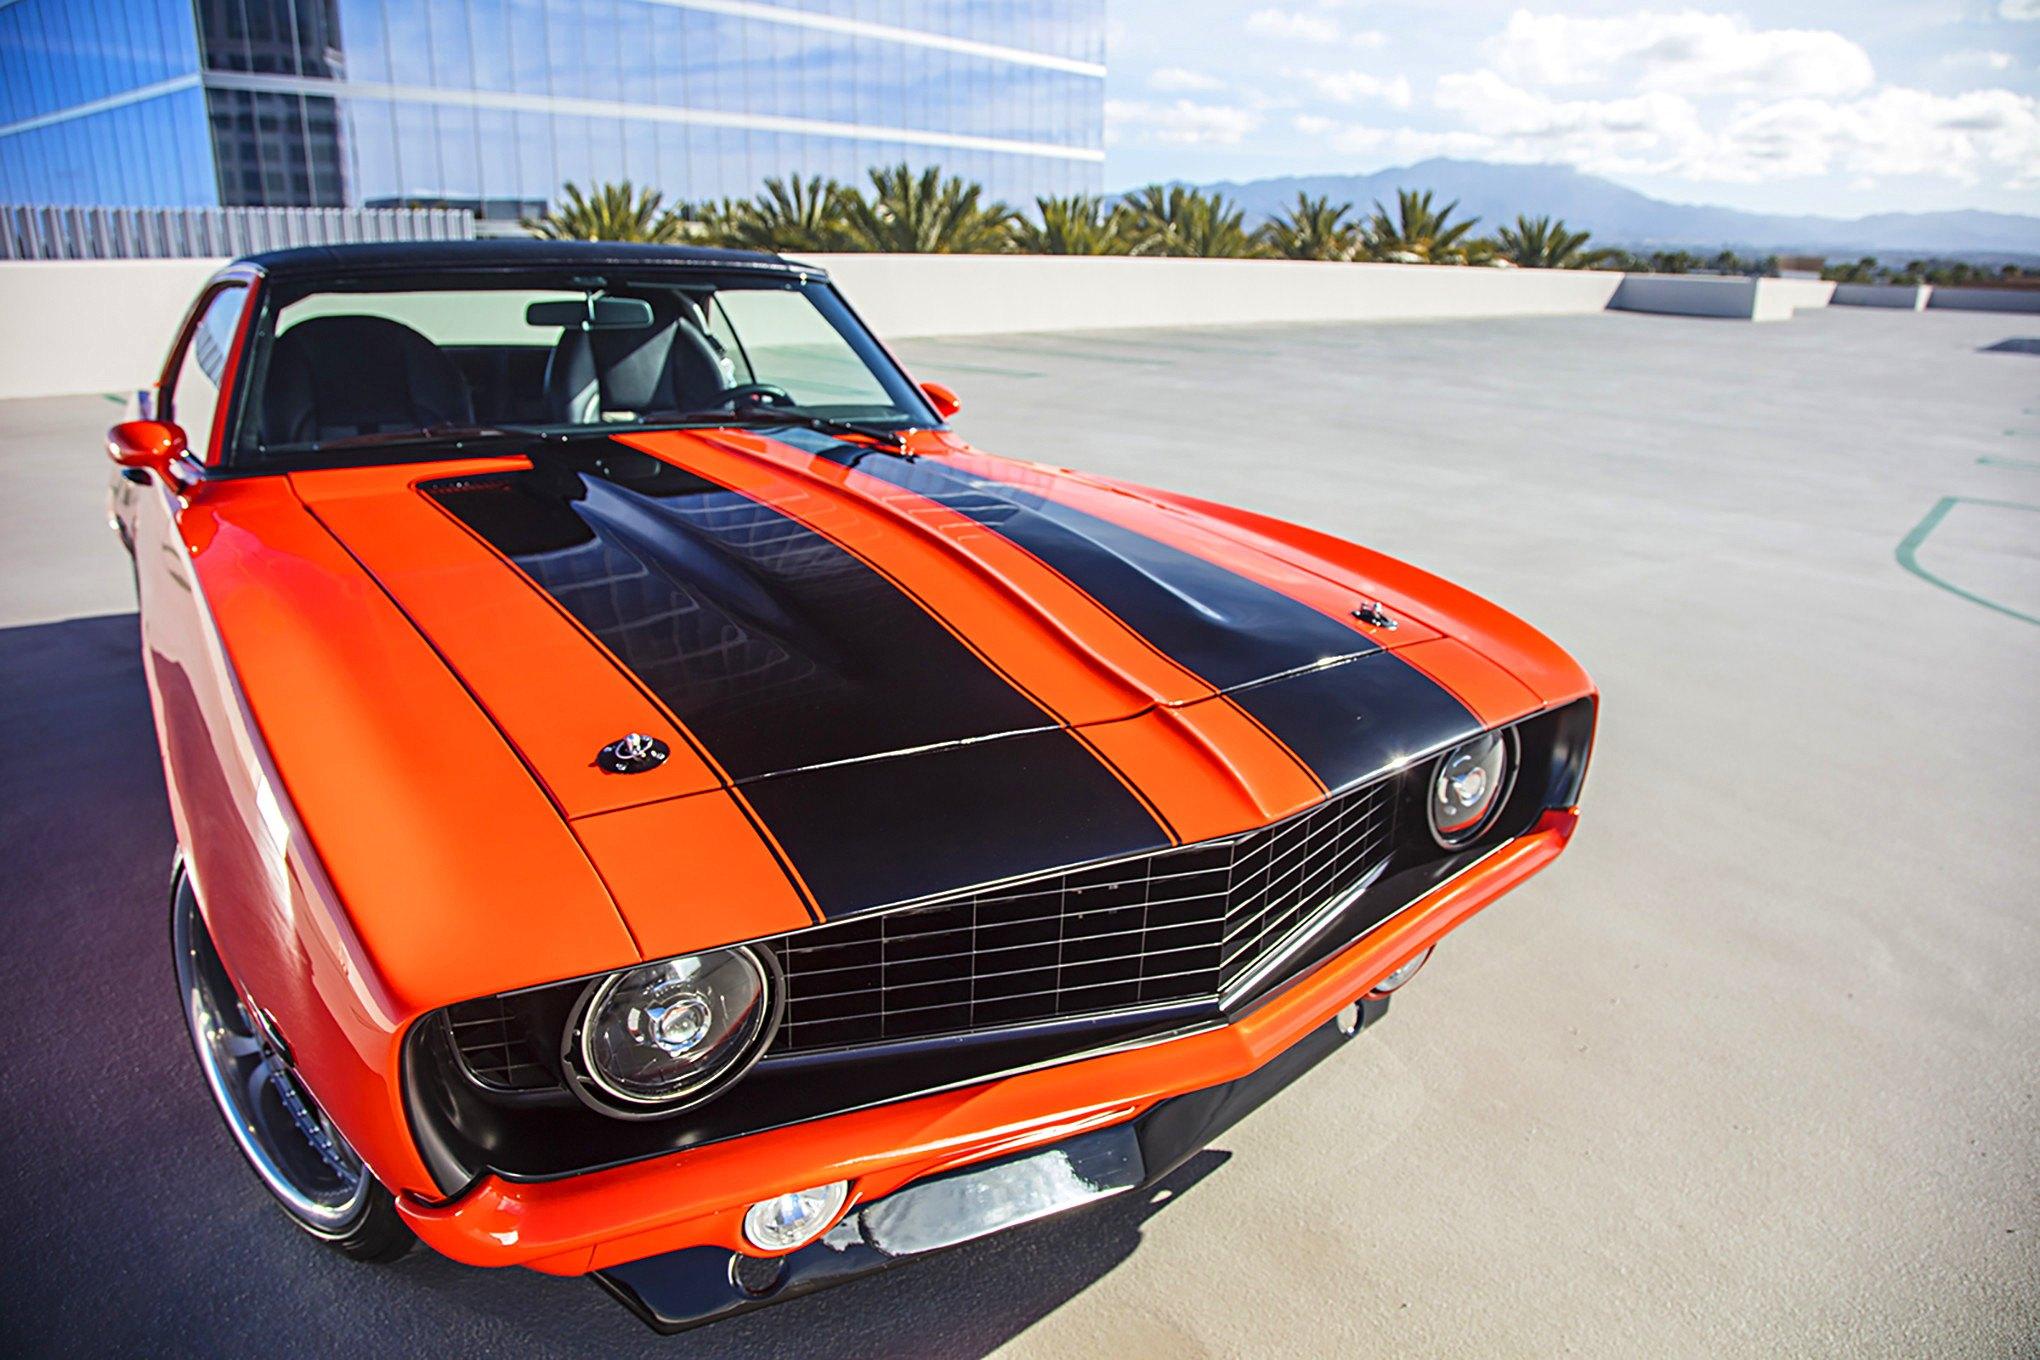 Custom Orange Chevy Camaro With Black Stripes Photo By Tim Sutton